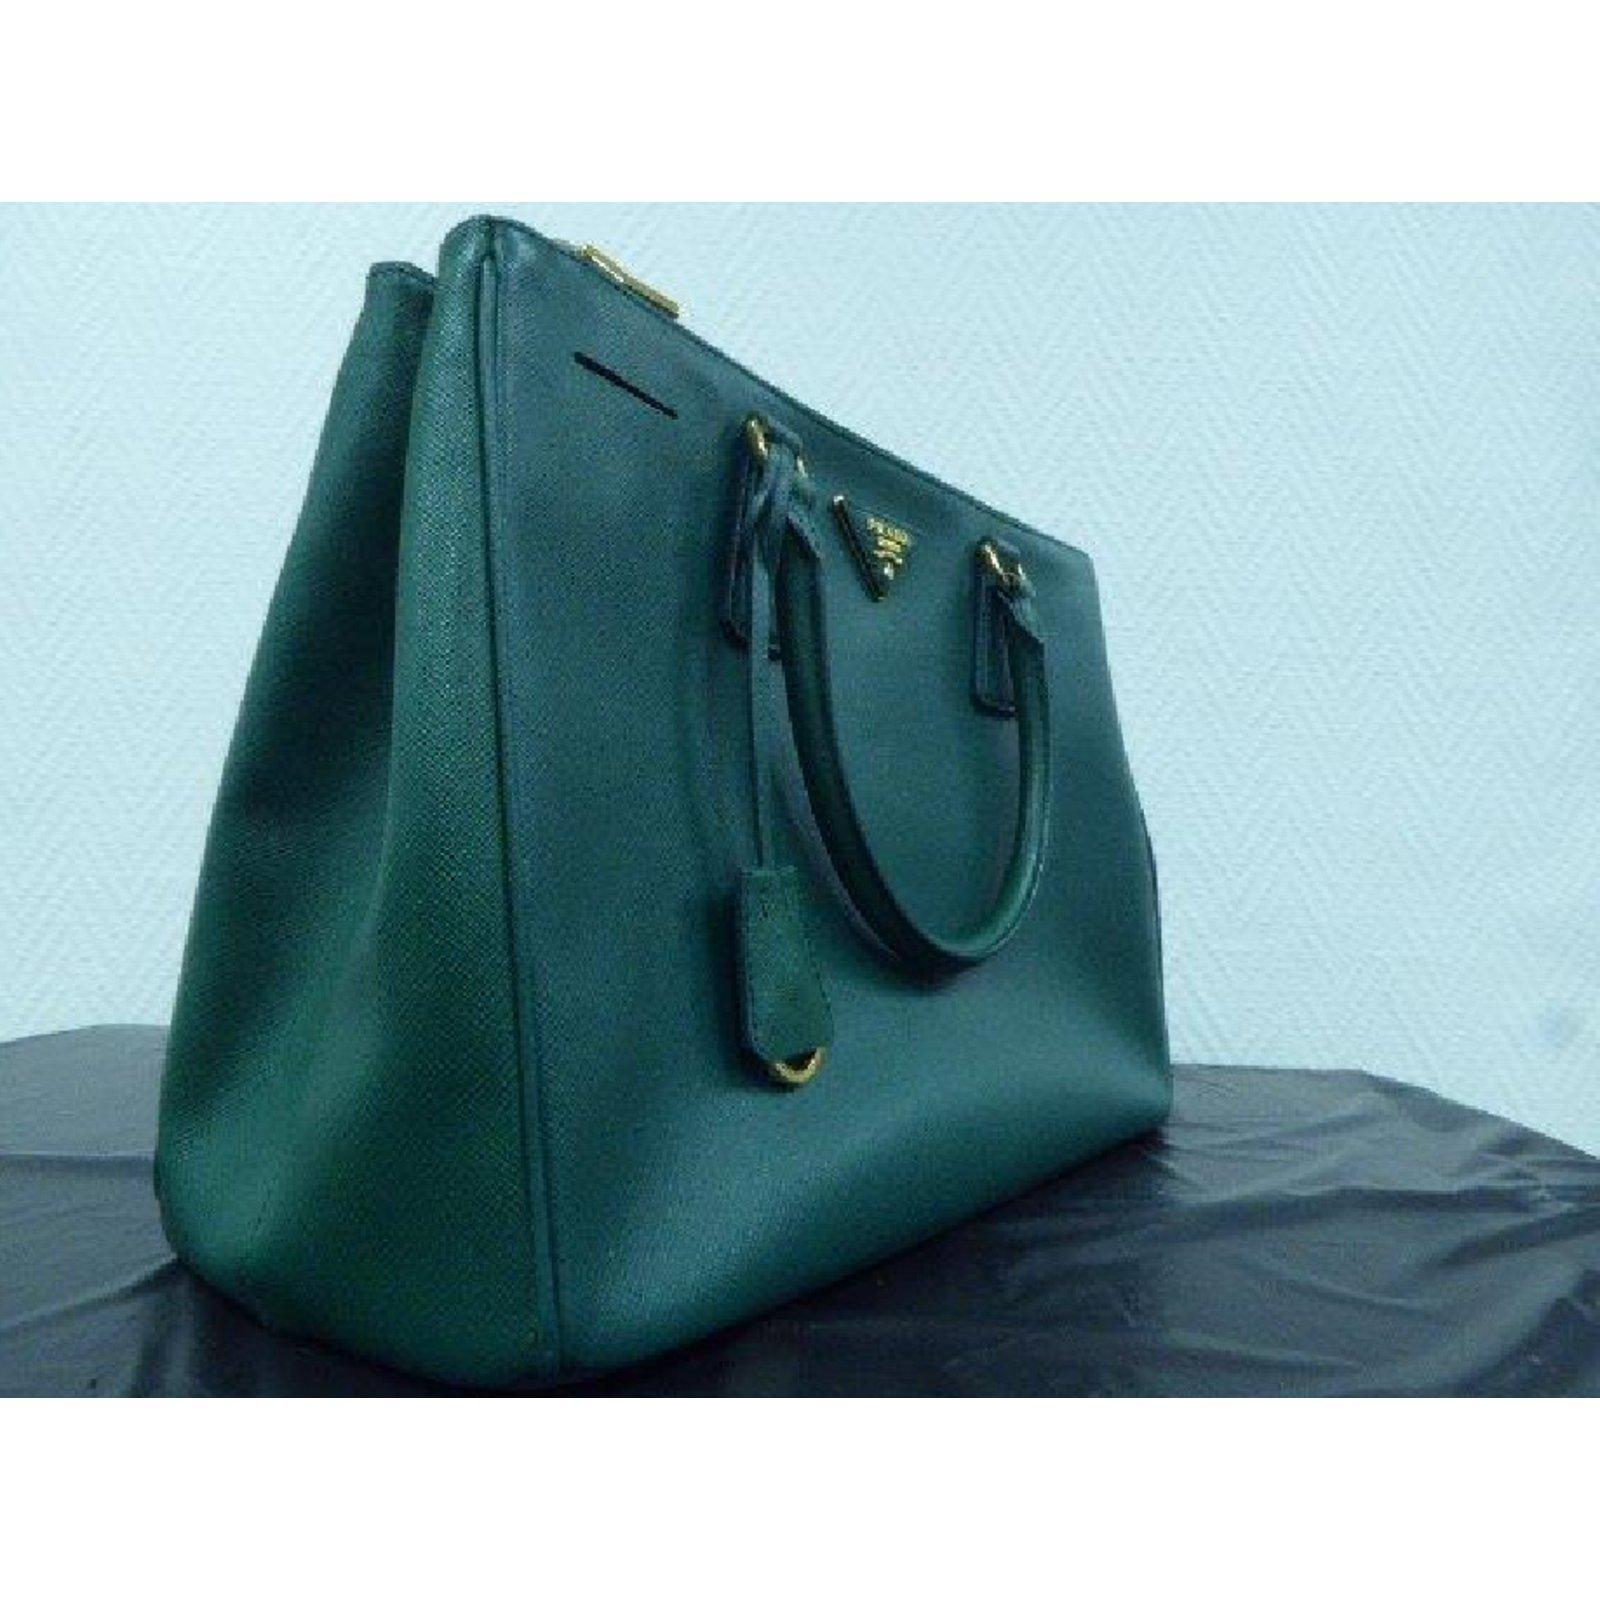 b8f077b217 Prada Prada Saffiano Tote Totes Leather Green ref.40046 - Joli Closet